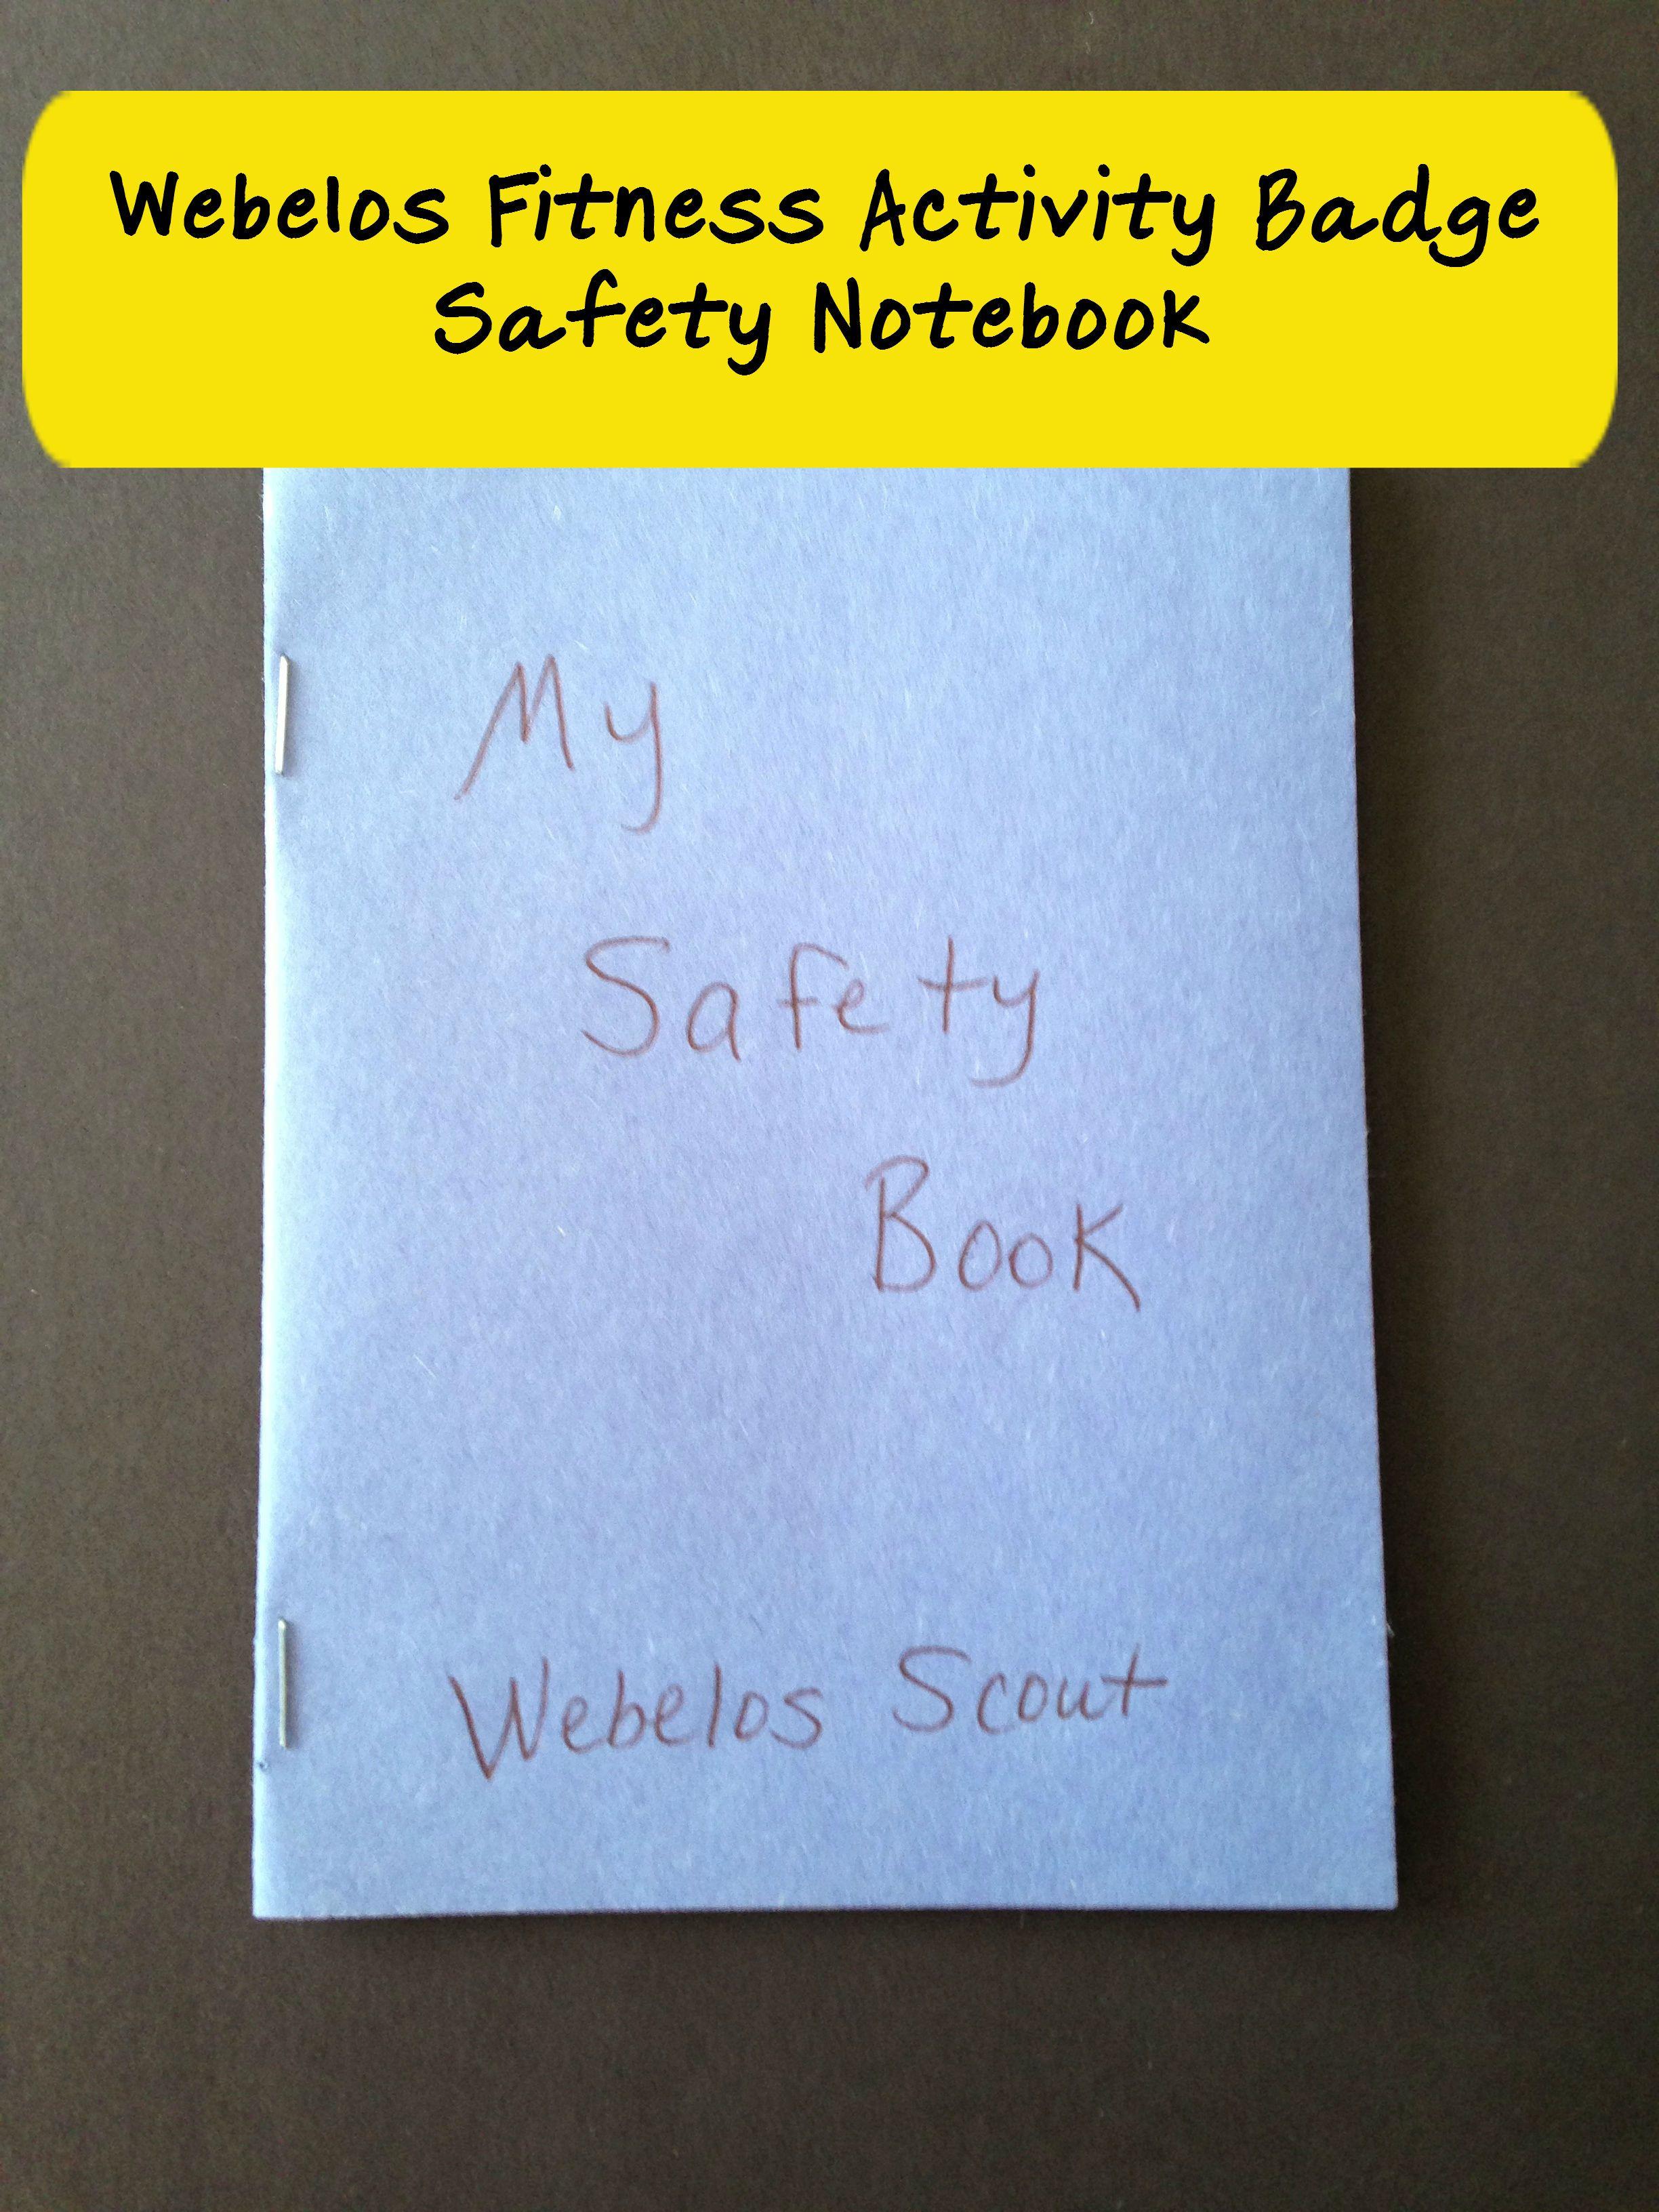 worksheet Webelos Fitness Worksheet webelos fitness worksheet free worksheets library download and worksheet